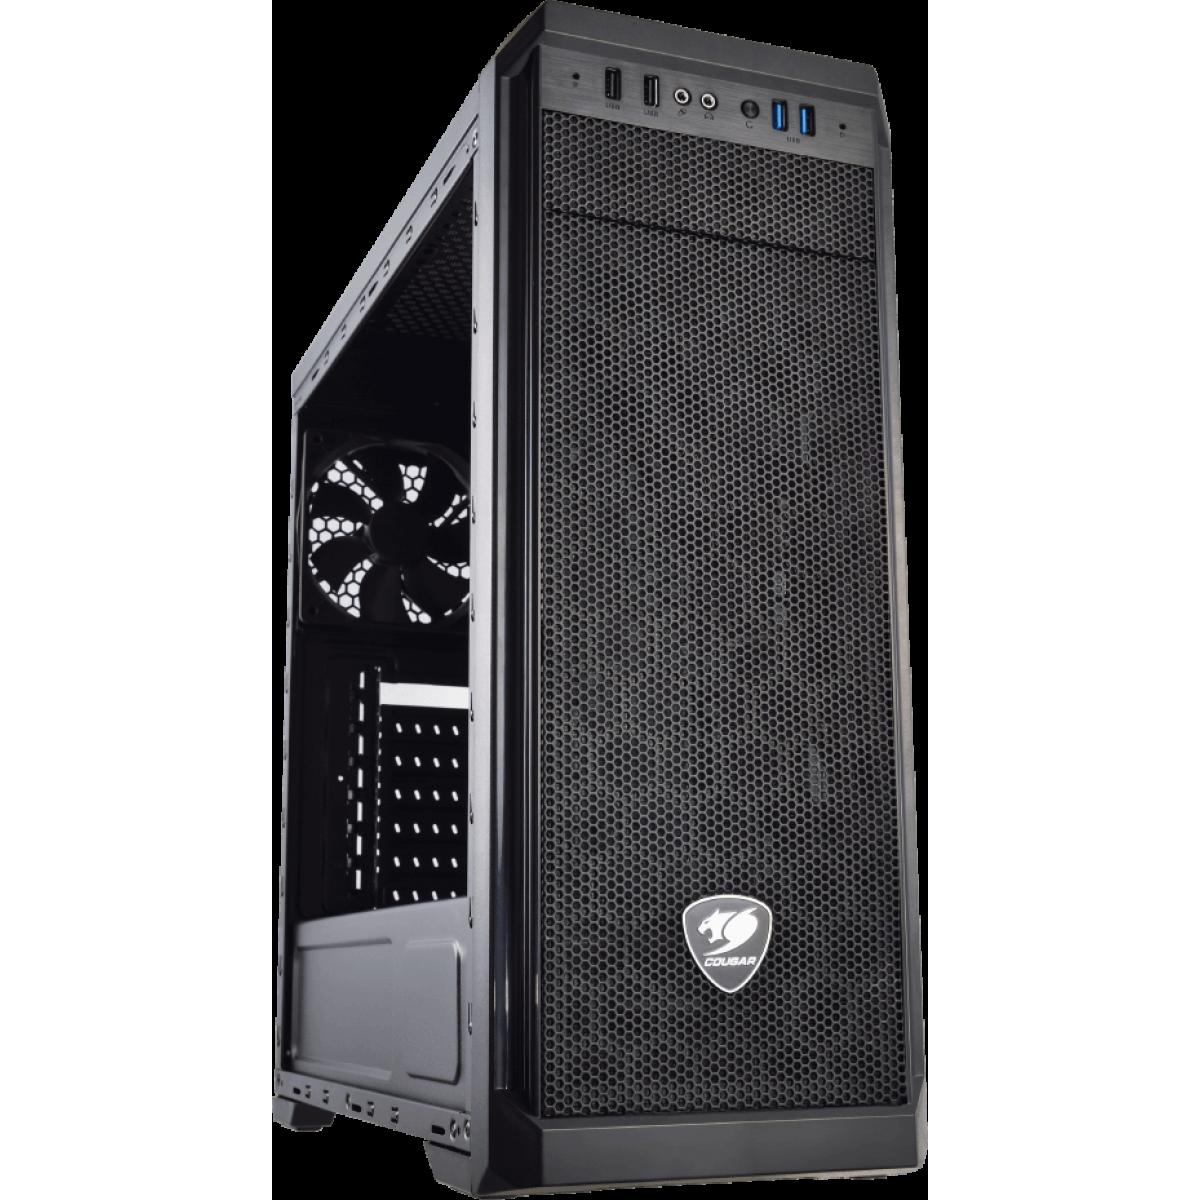 Gabinete Gamer Cougar MX330 385NC10.0002 Lateral em Acrílico Mid Tower Preto S/Fonte